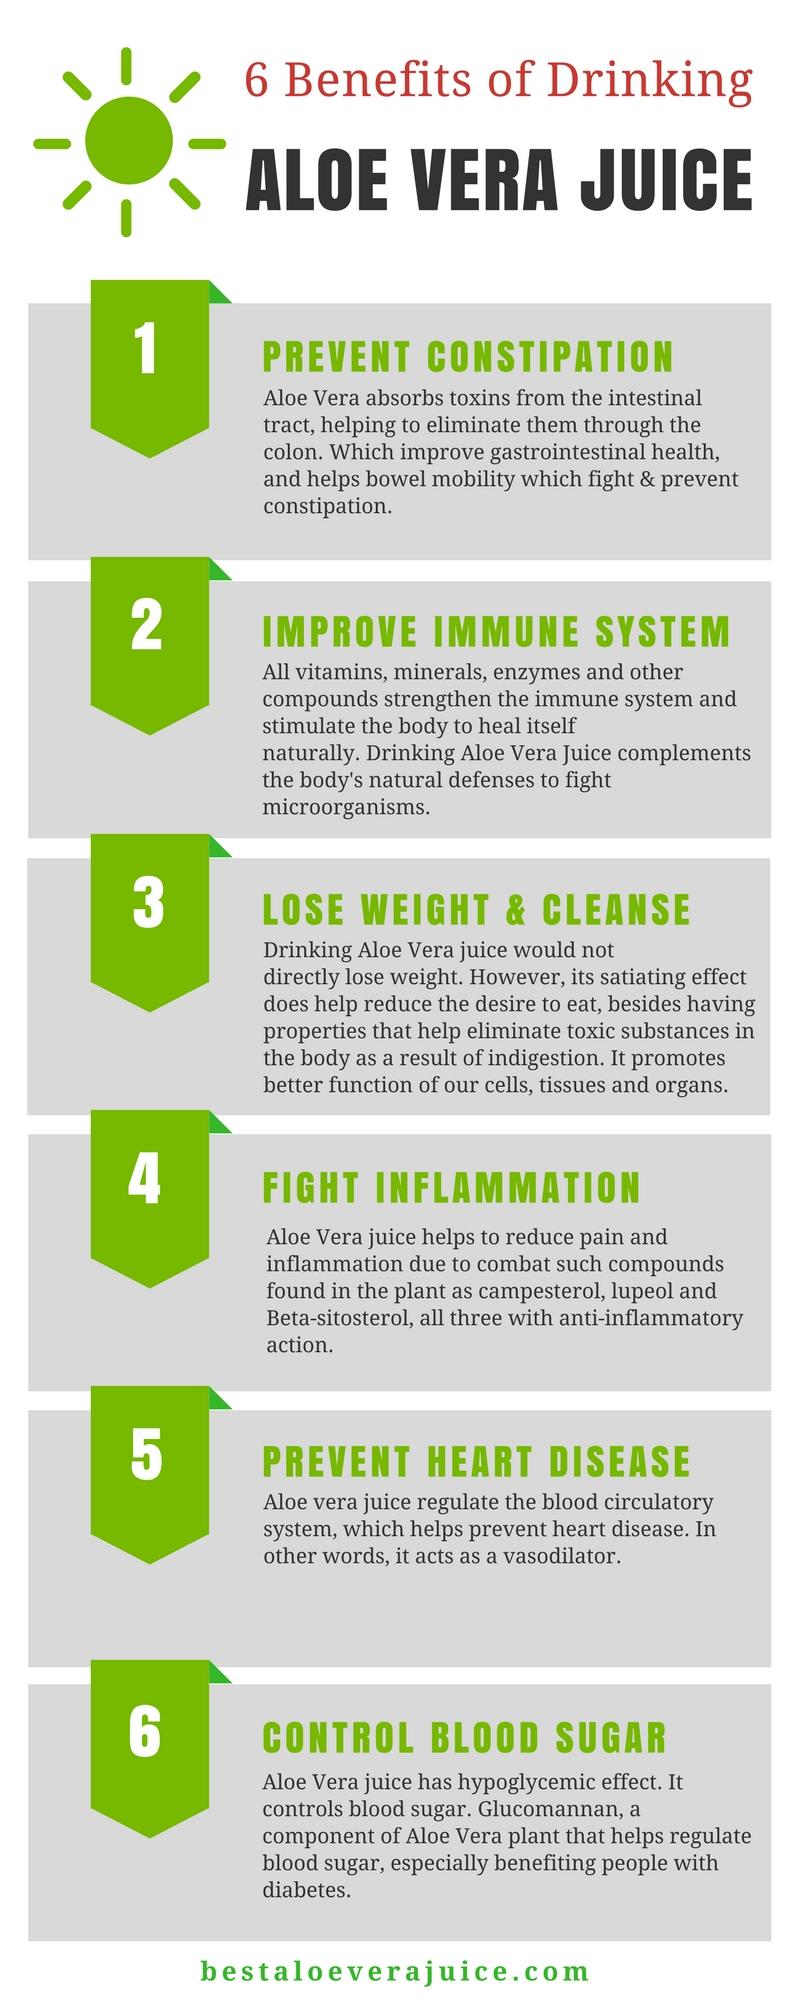 6 benefits of drinking Aloe Vera Juice